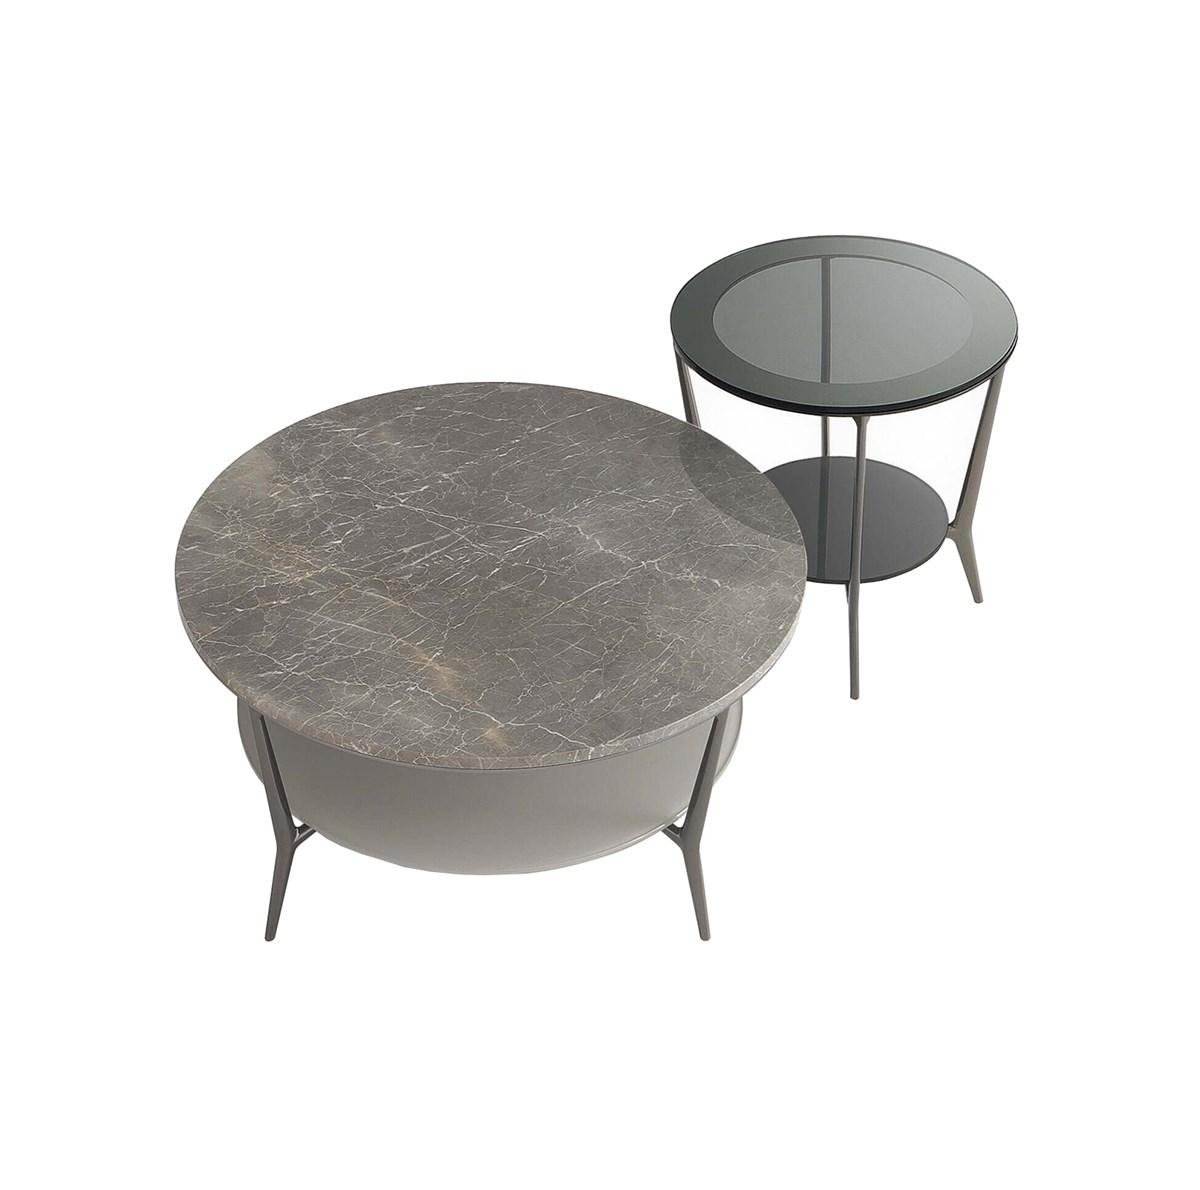 Rimadesio-Giuseppe-Bavuso-Planet-Low-Table-Matisse-1